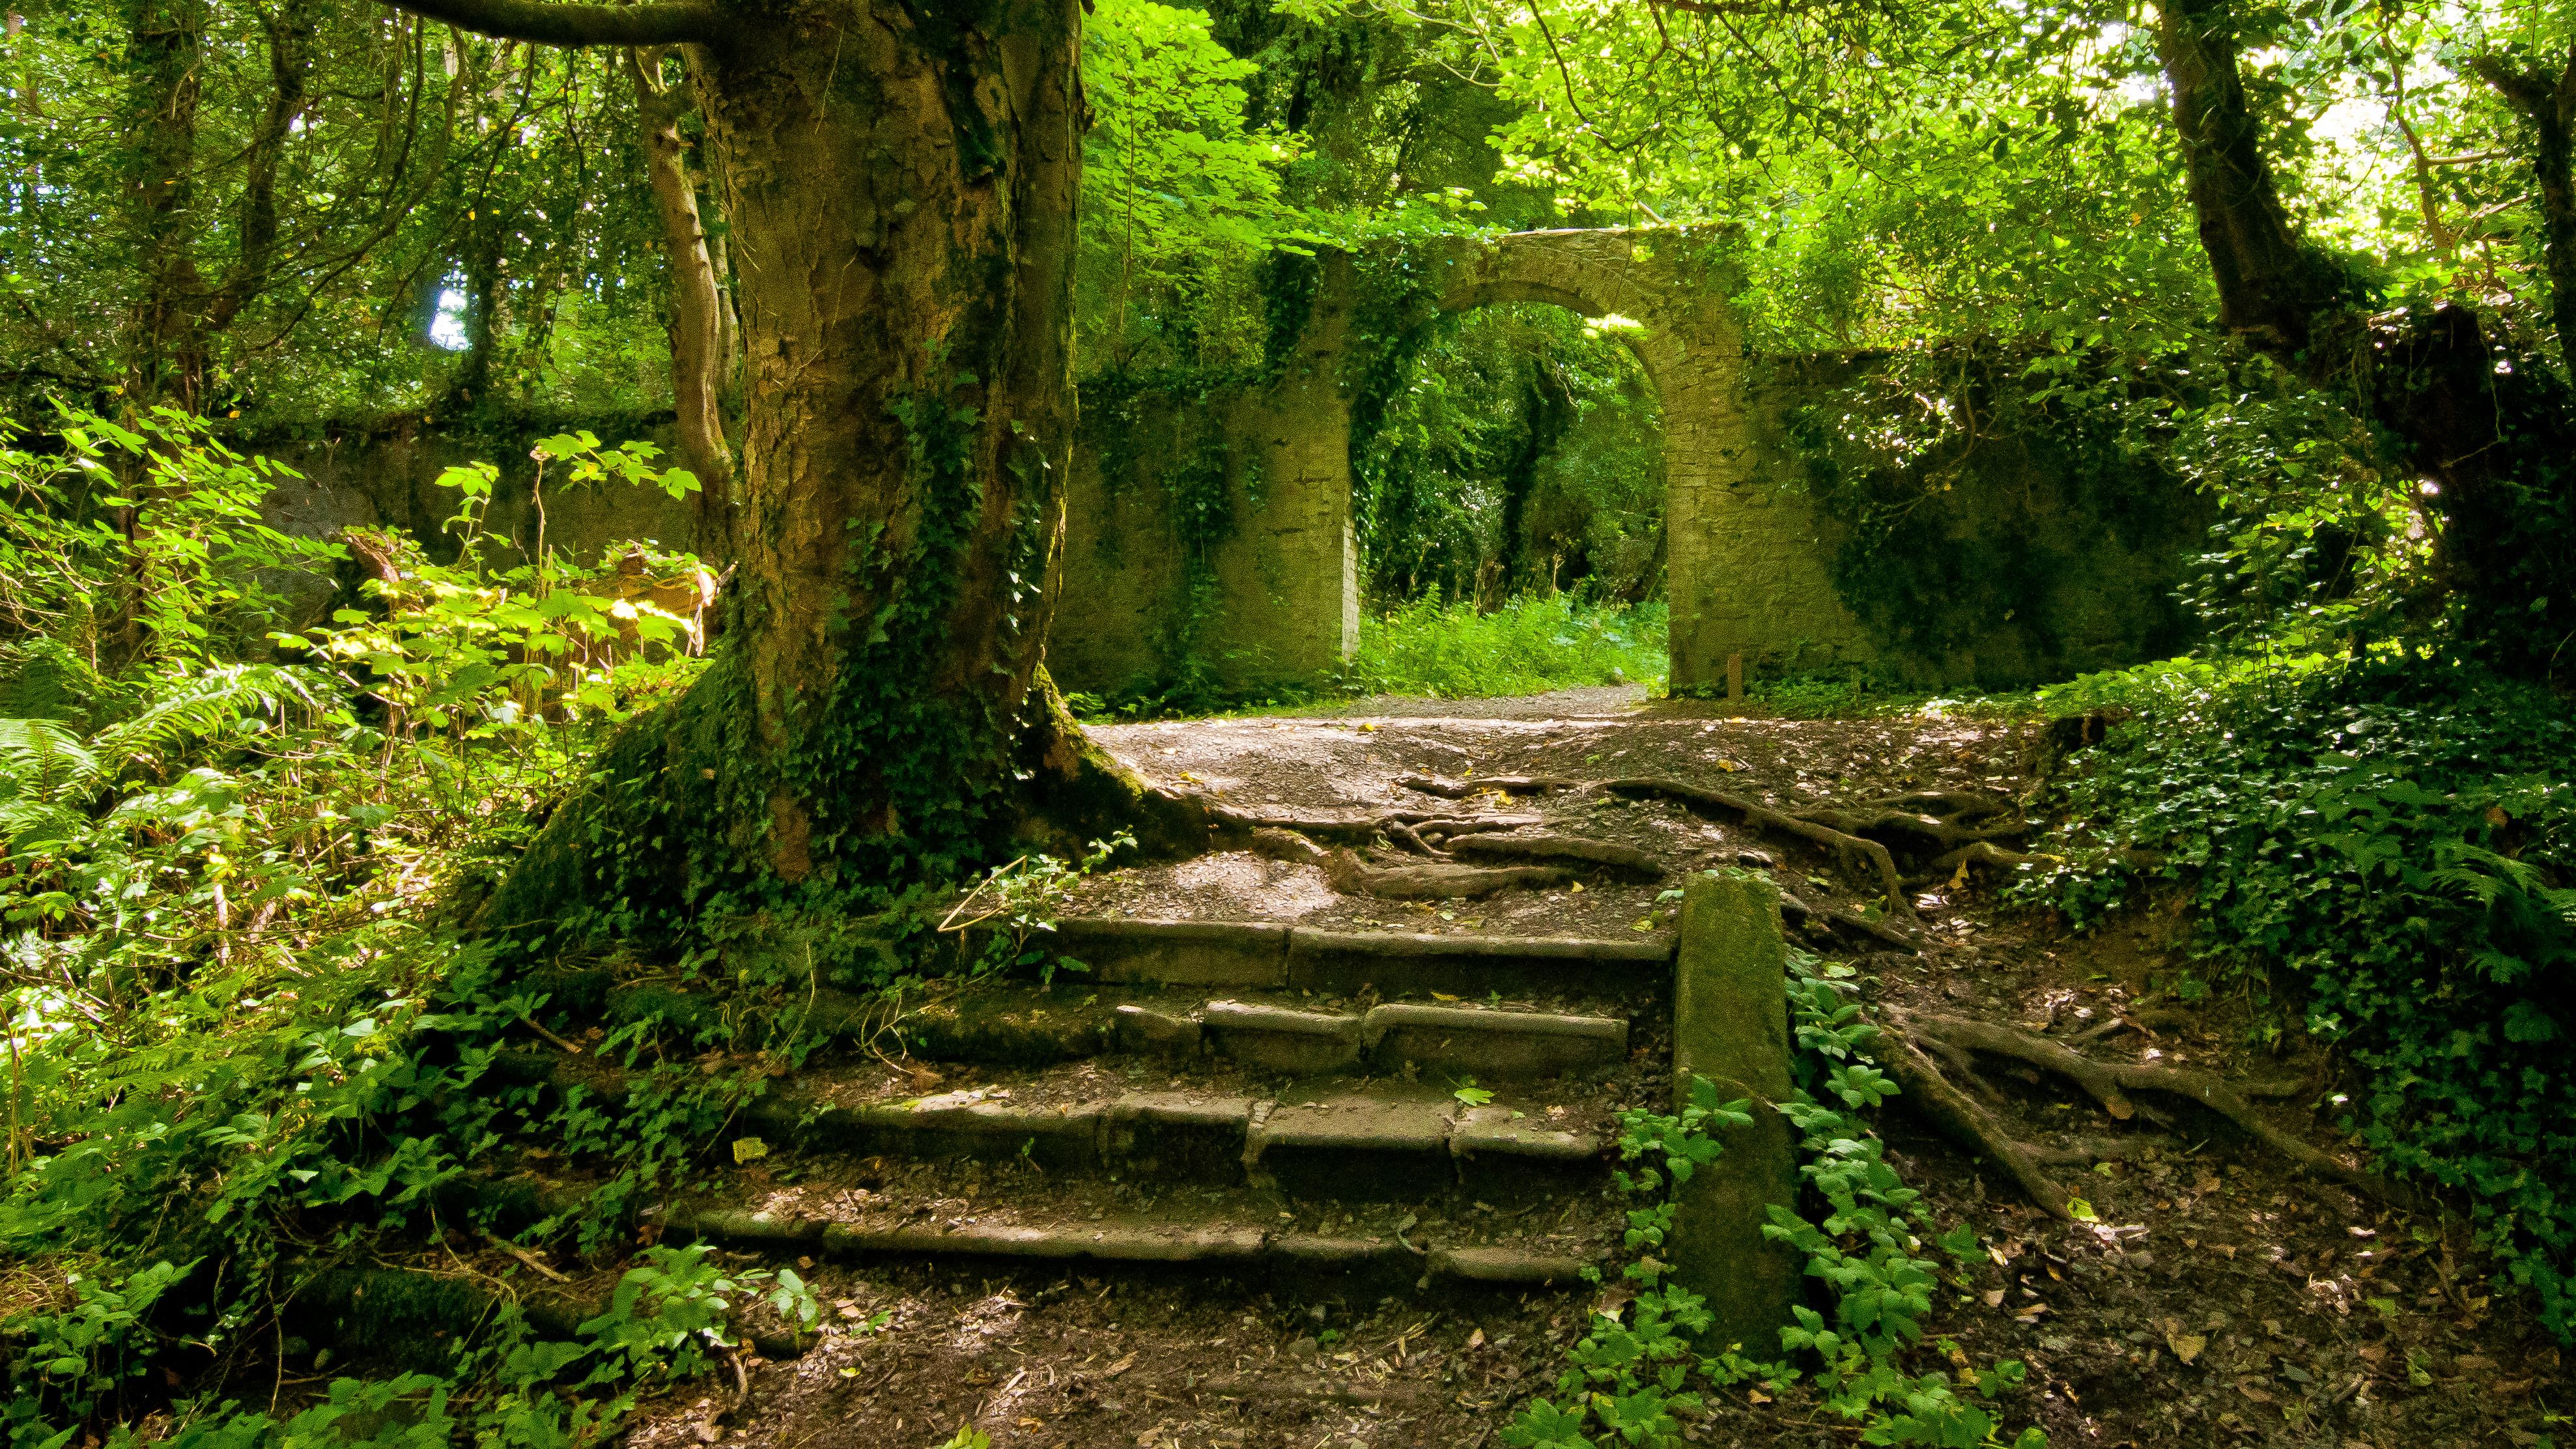 Charming Churches In Sherwood Or #1: Killakee_Estate_Ruined_Garden_(Summer).jpg